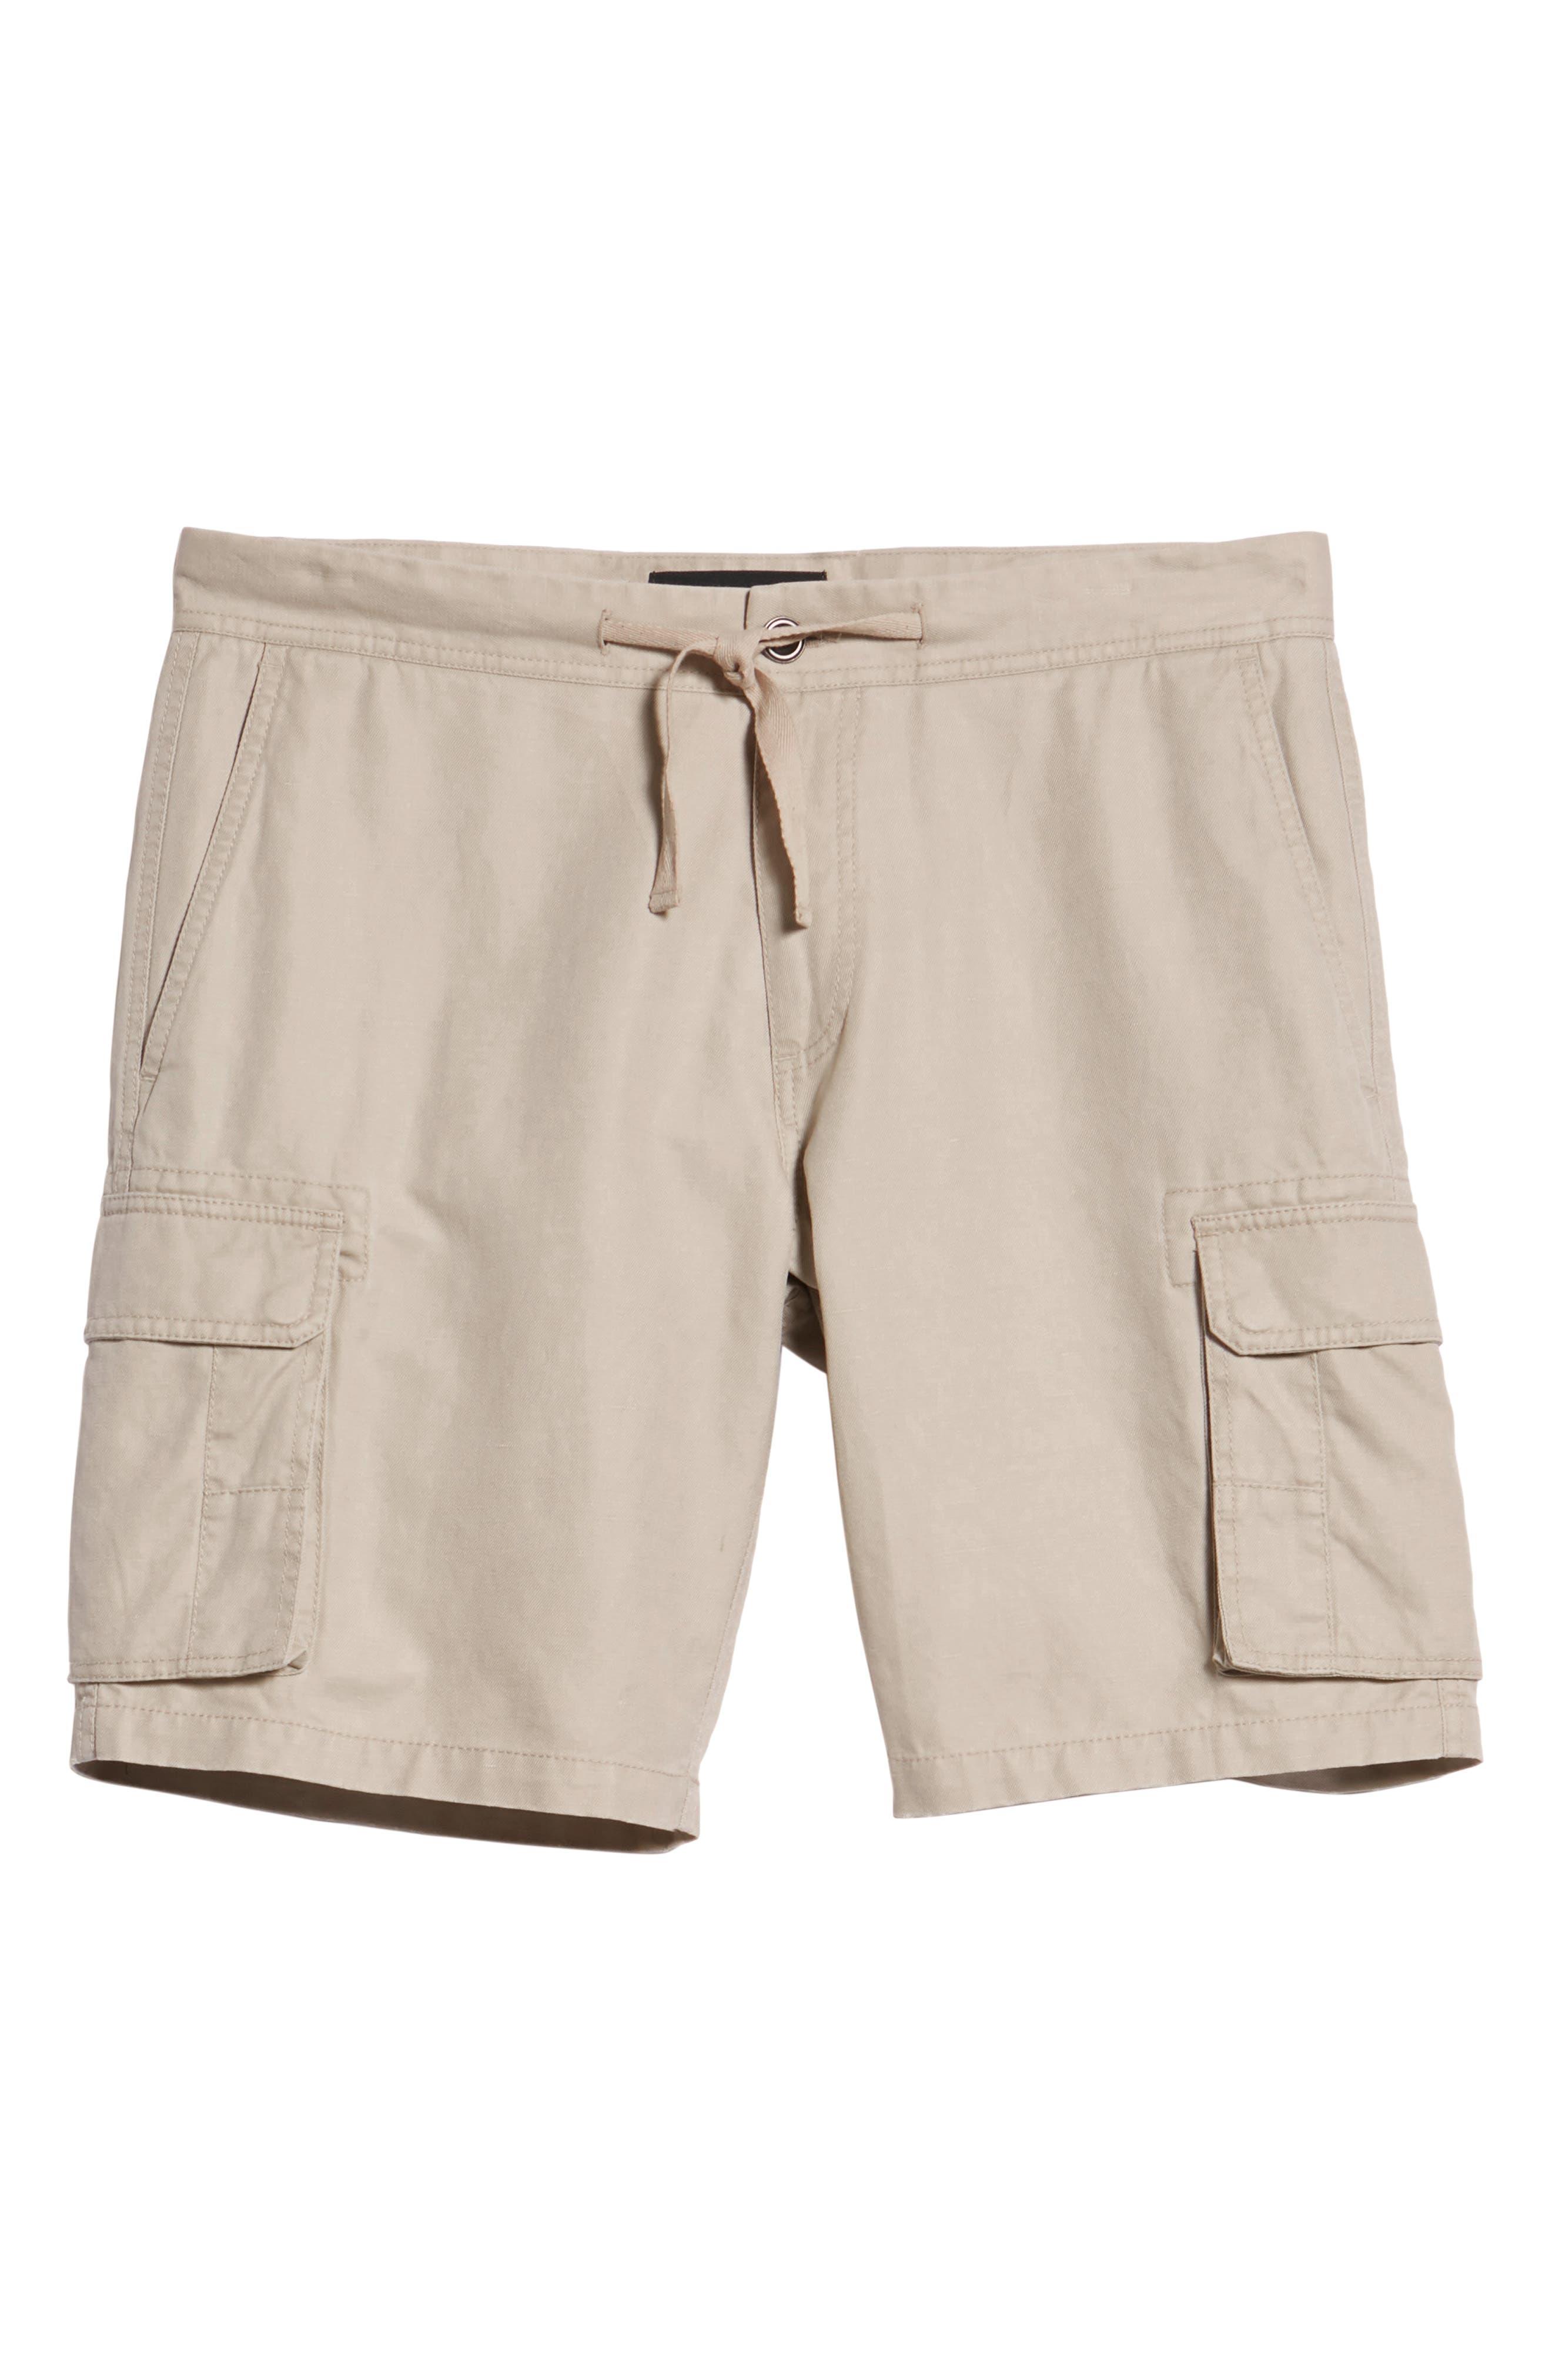 Sandyford Cargo Shorts,                             Alternate thumbnail 6, color,                             NATURAL